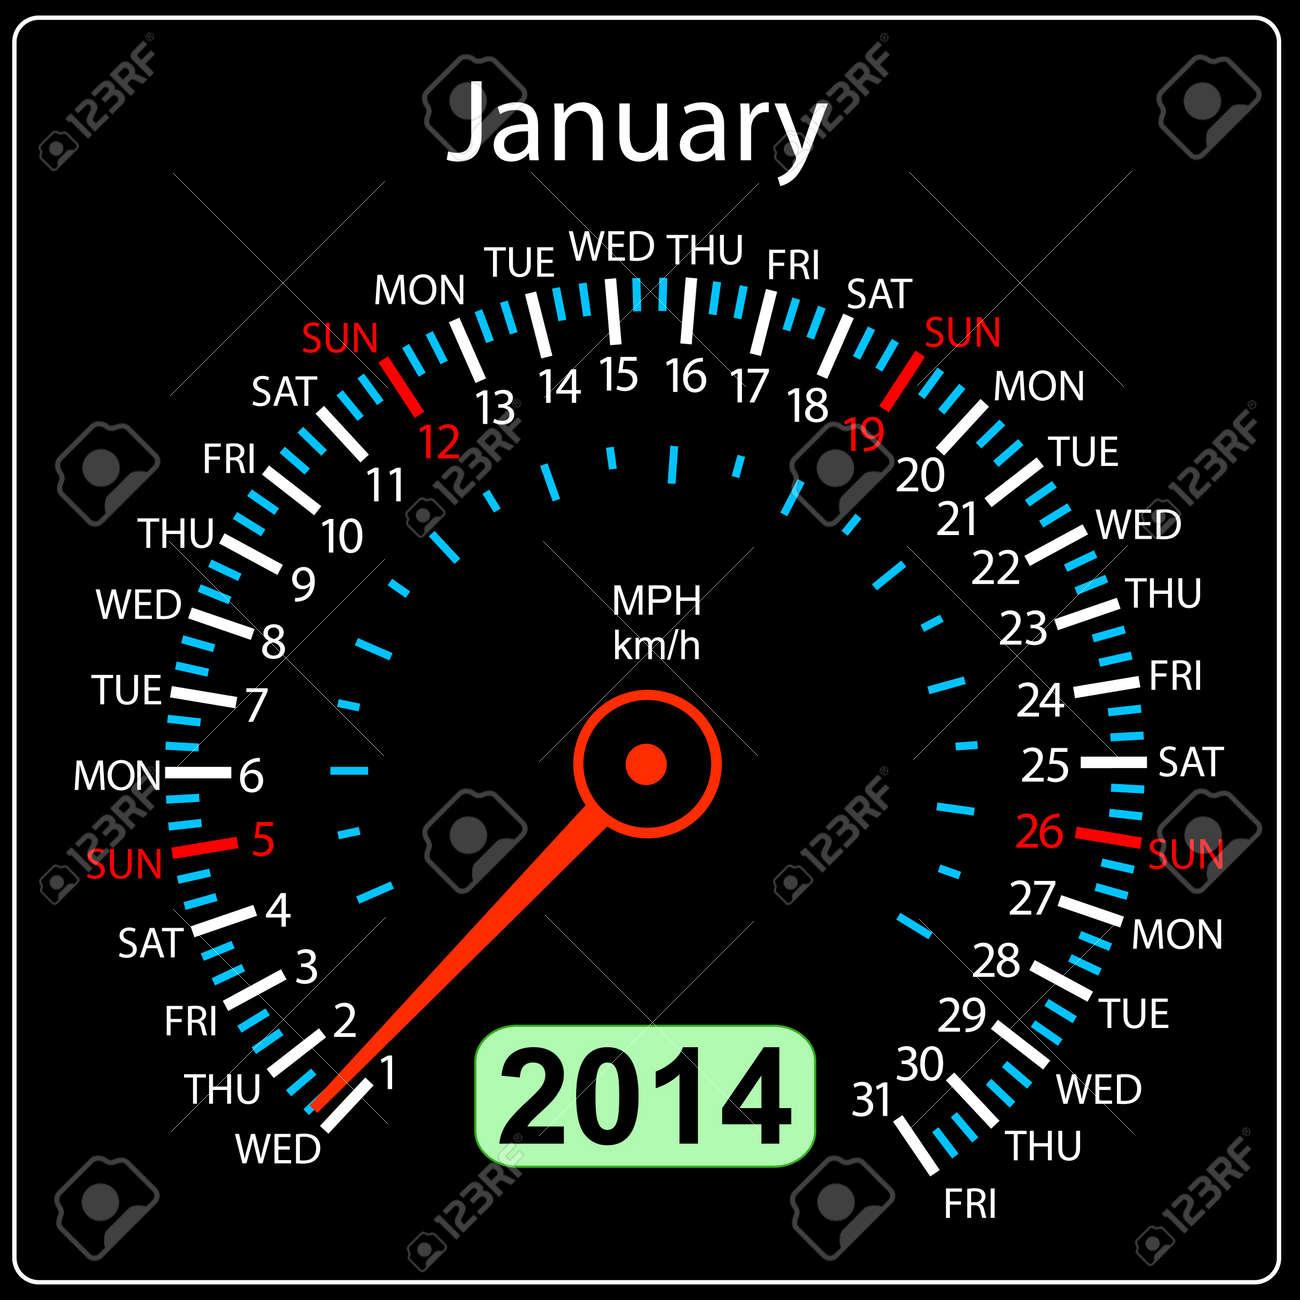 2014 year calendar speedometer car in  January Stock Vector - 17603327